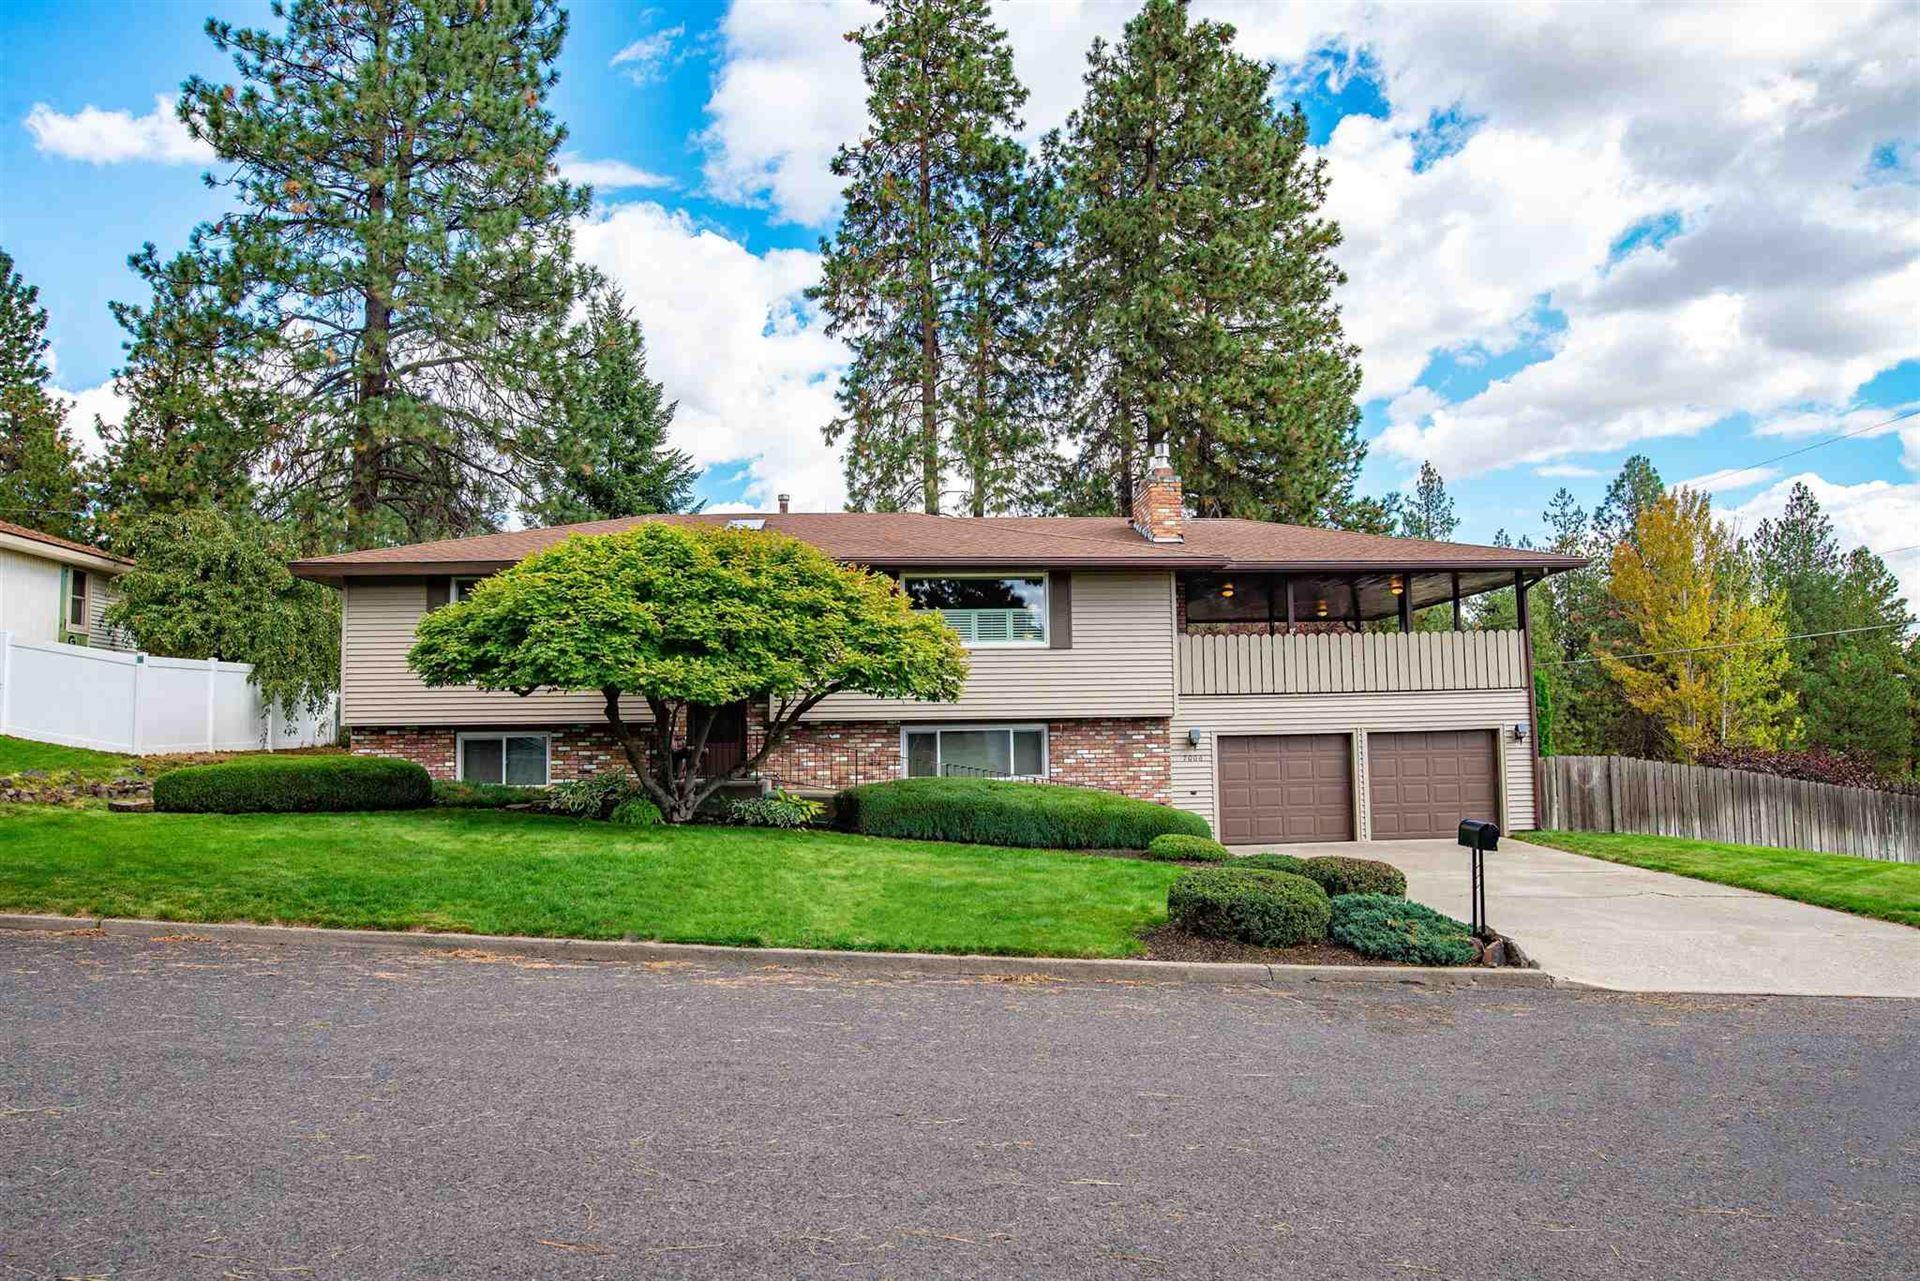 7006 N Elgin St, Spokane, WA 99208 - #: 202122762